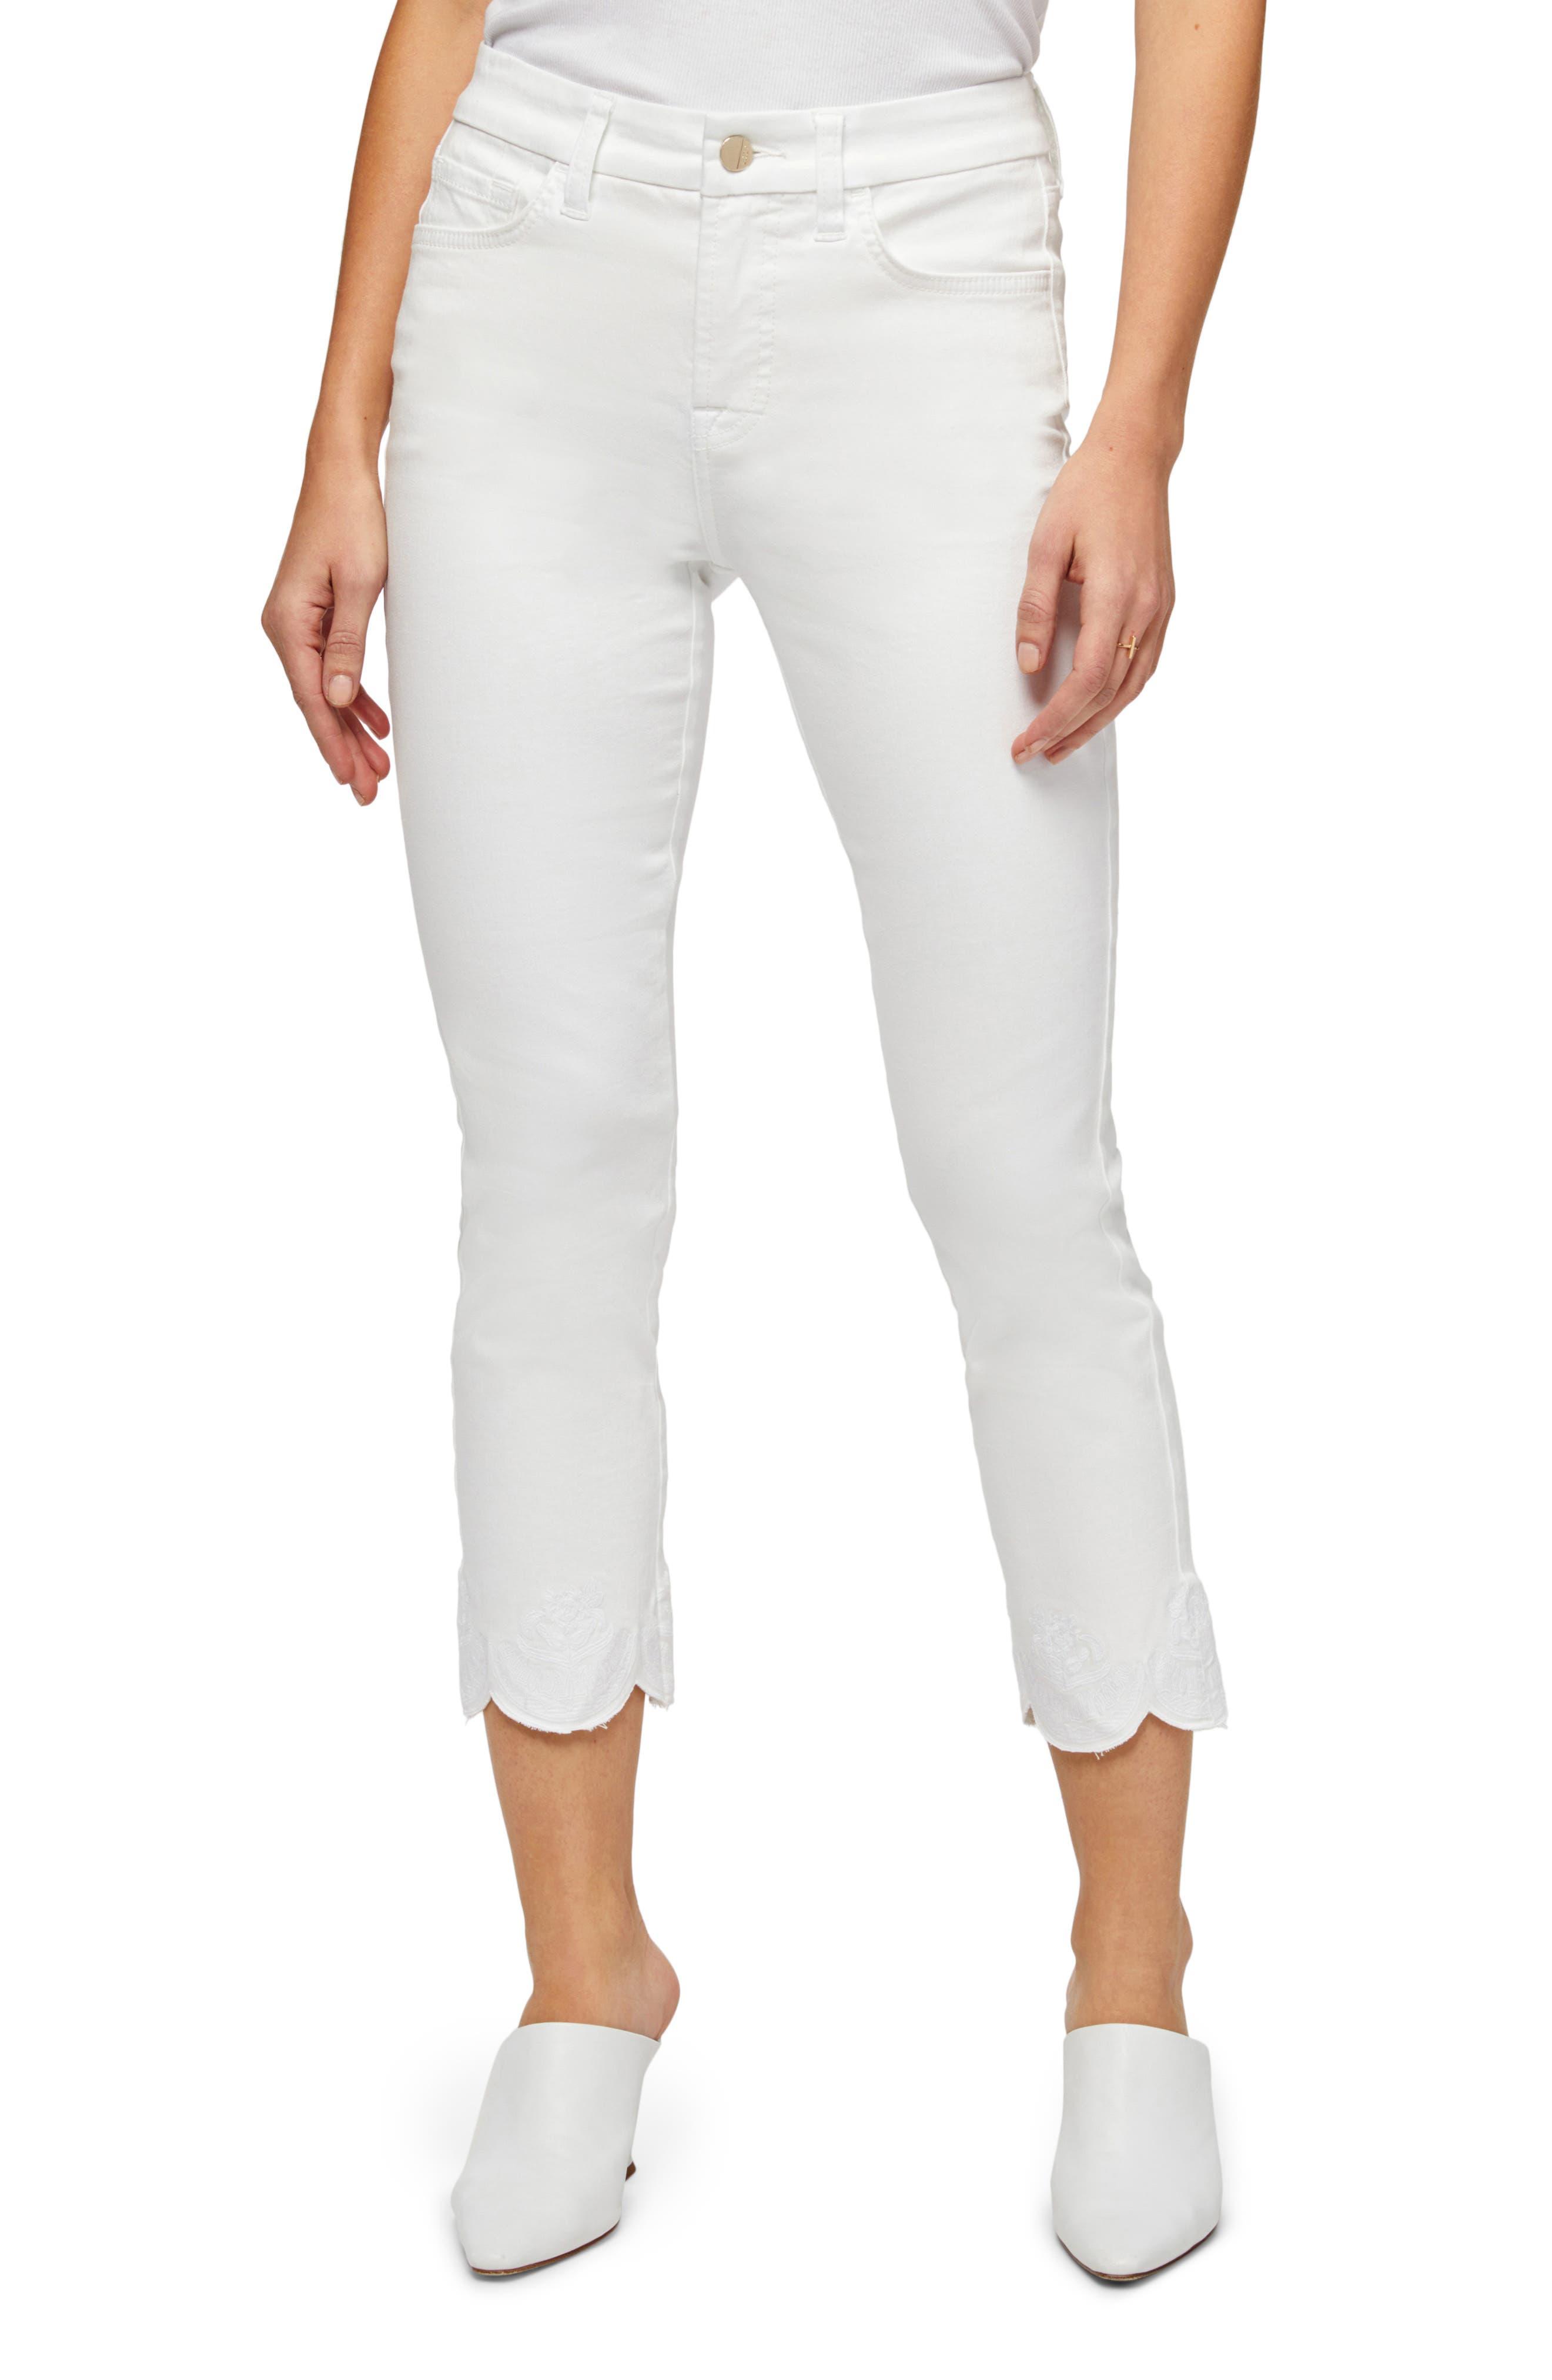 Embroidered Scallop Hem Crop Straight Leg Jeans